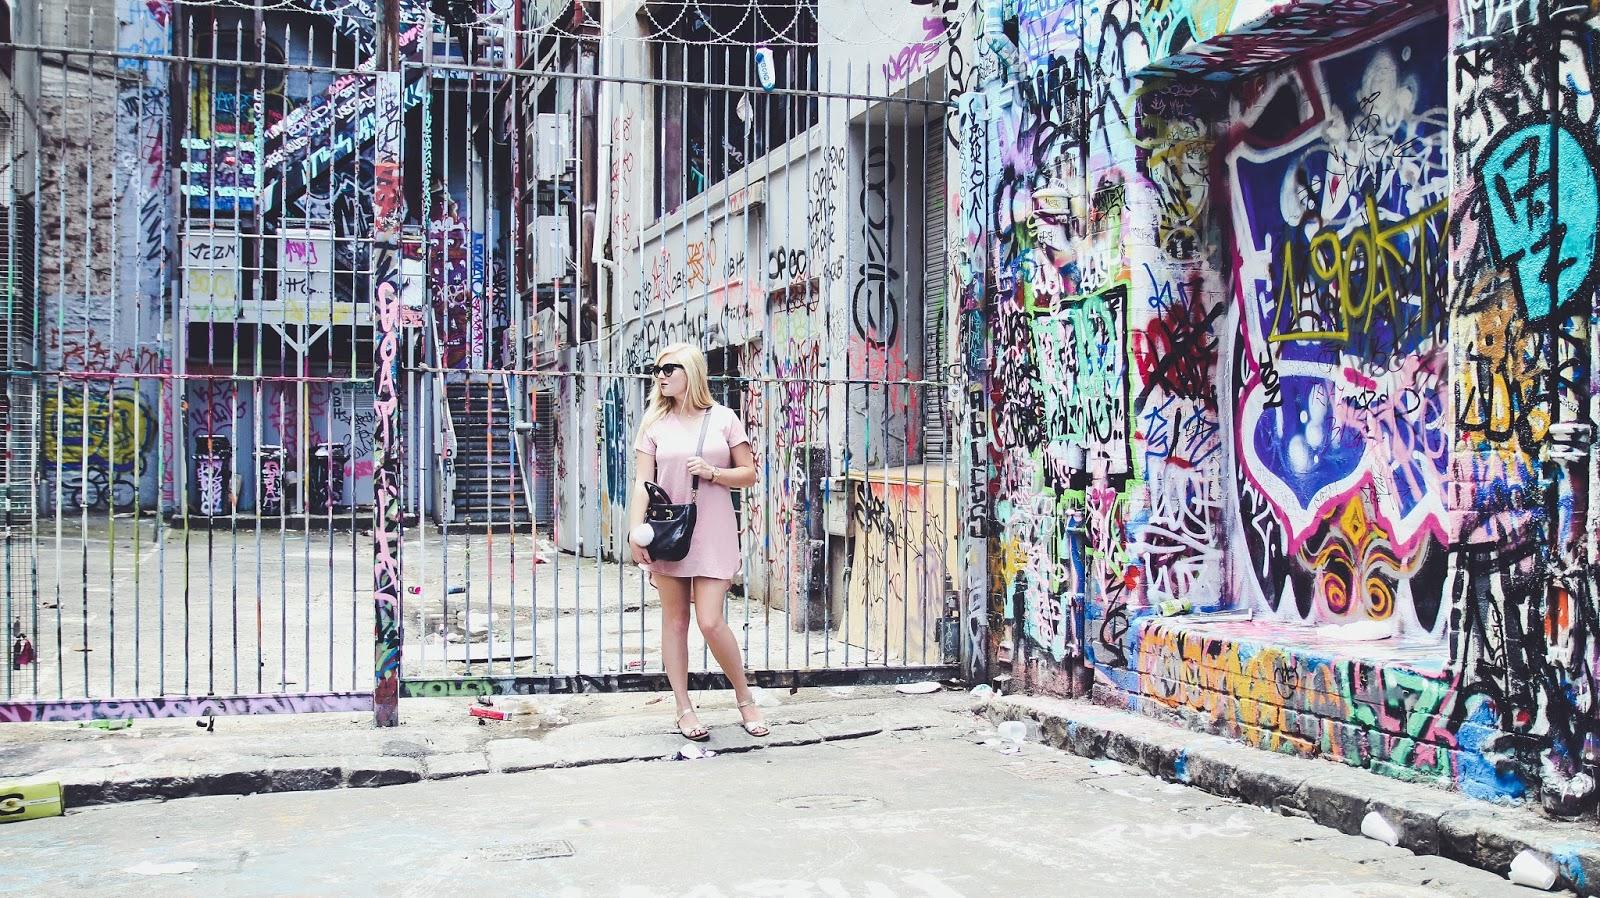 Hoiser Lane Grafitti Street Art in Melbourne, Australia | GlobalFashion Gal Travel Blog